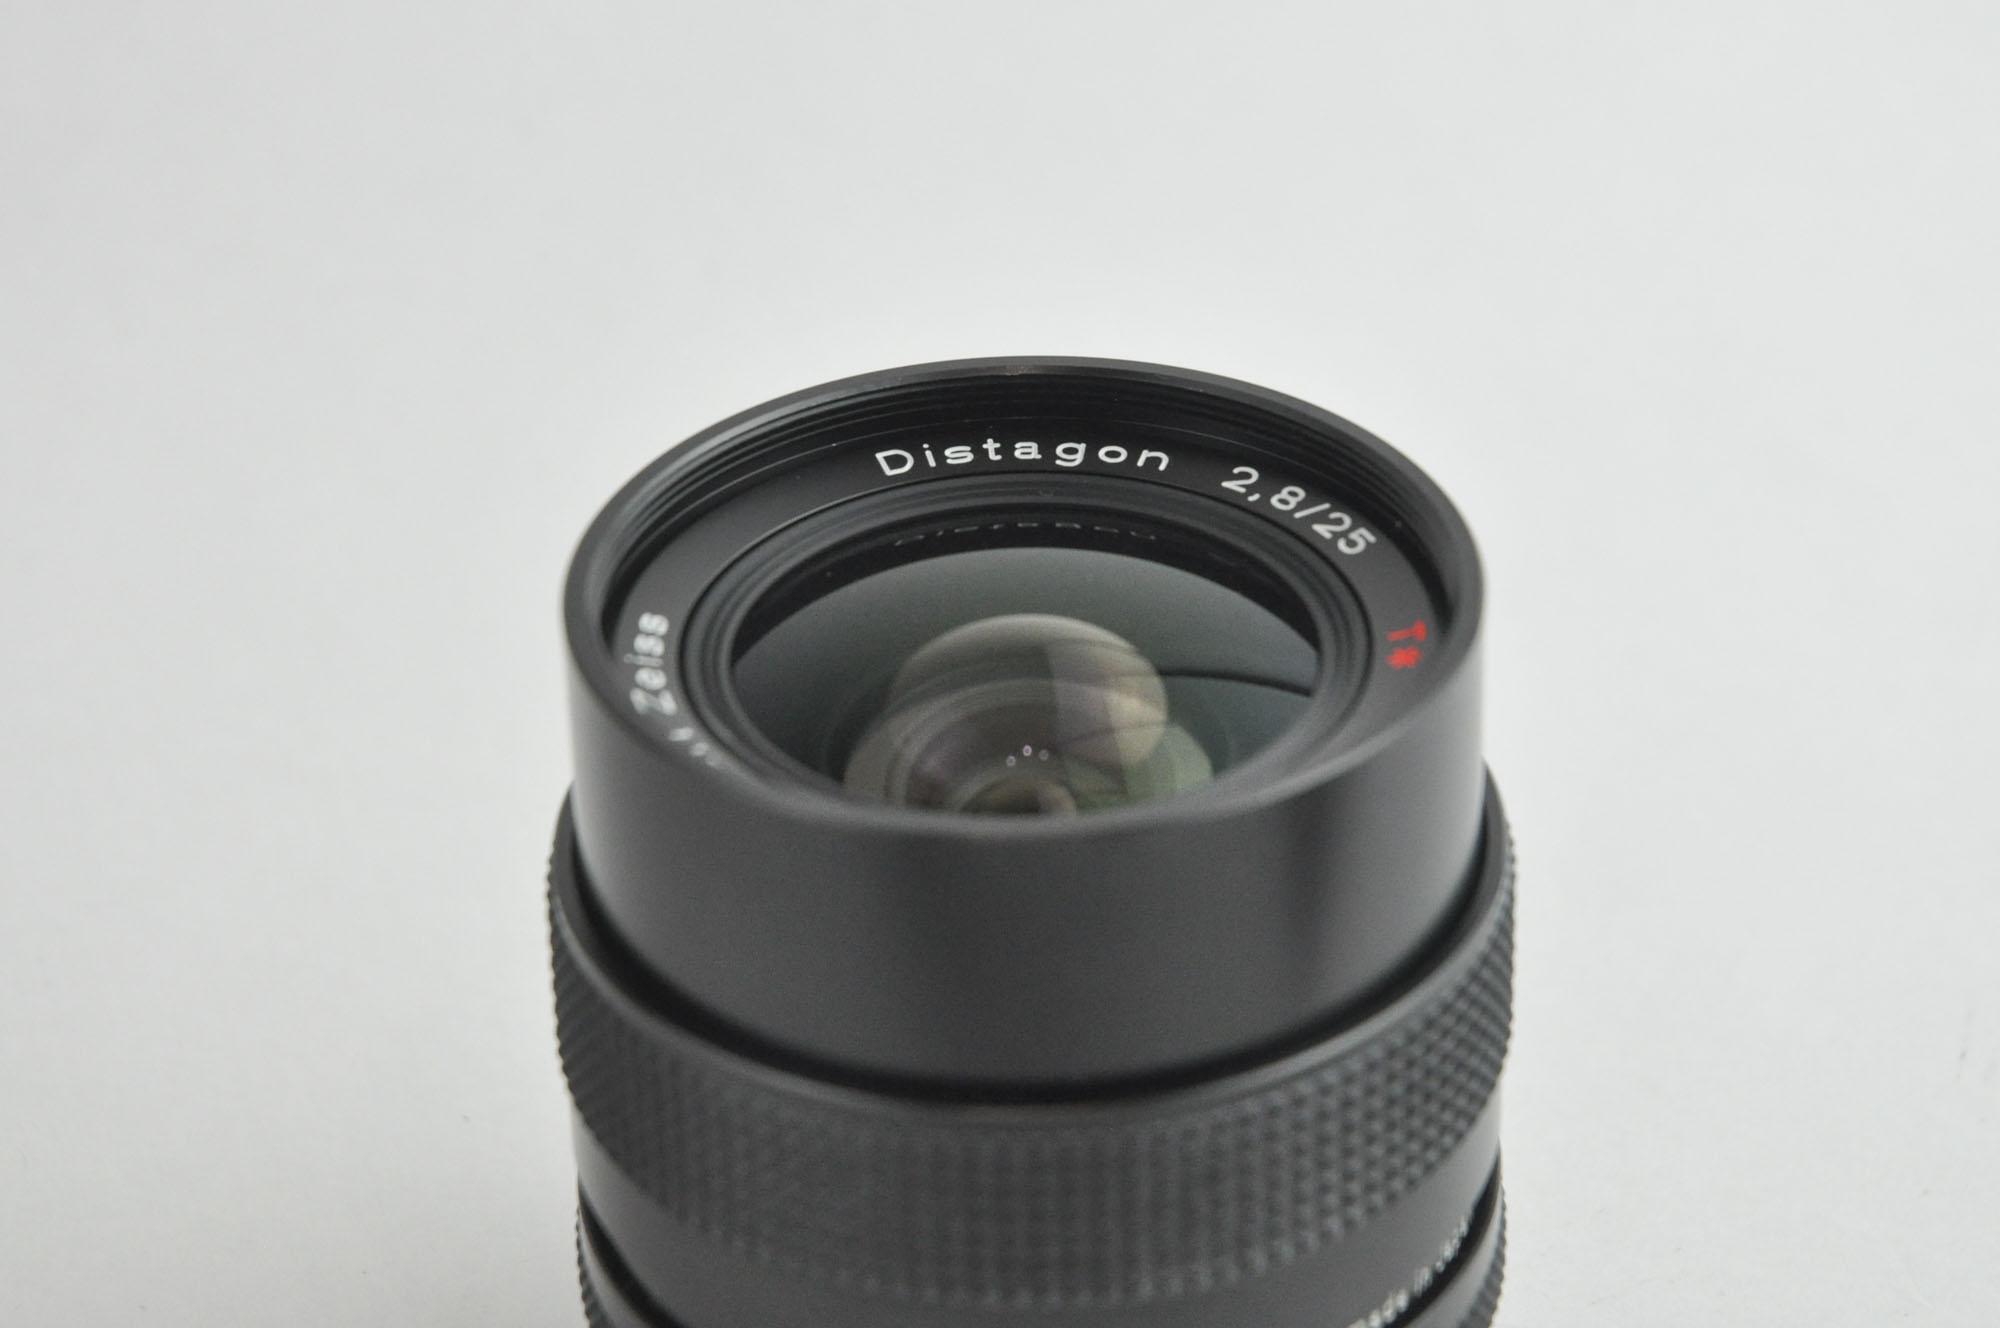 Carl zeiss Planar 25mm f2.8 AEJ